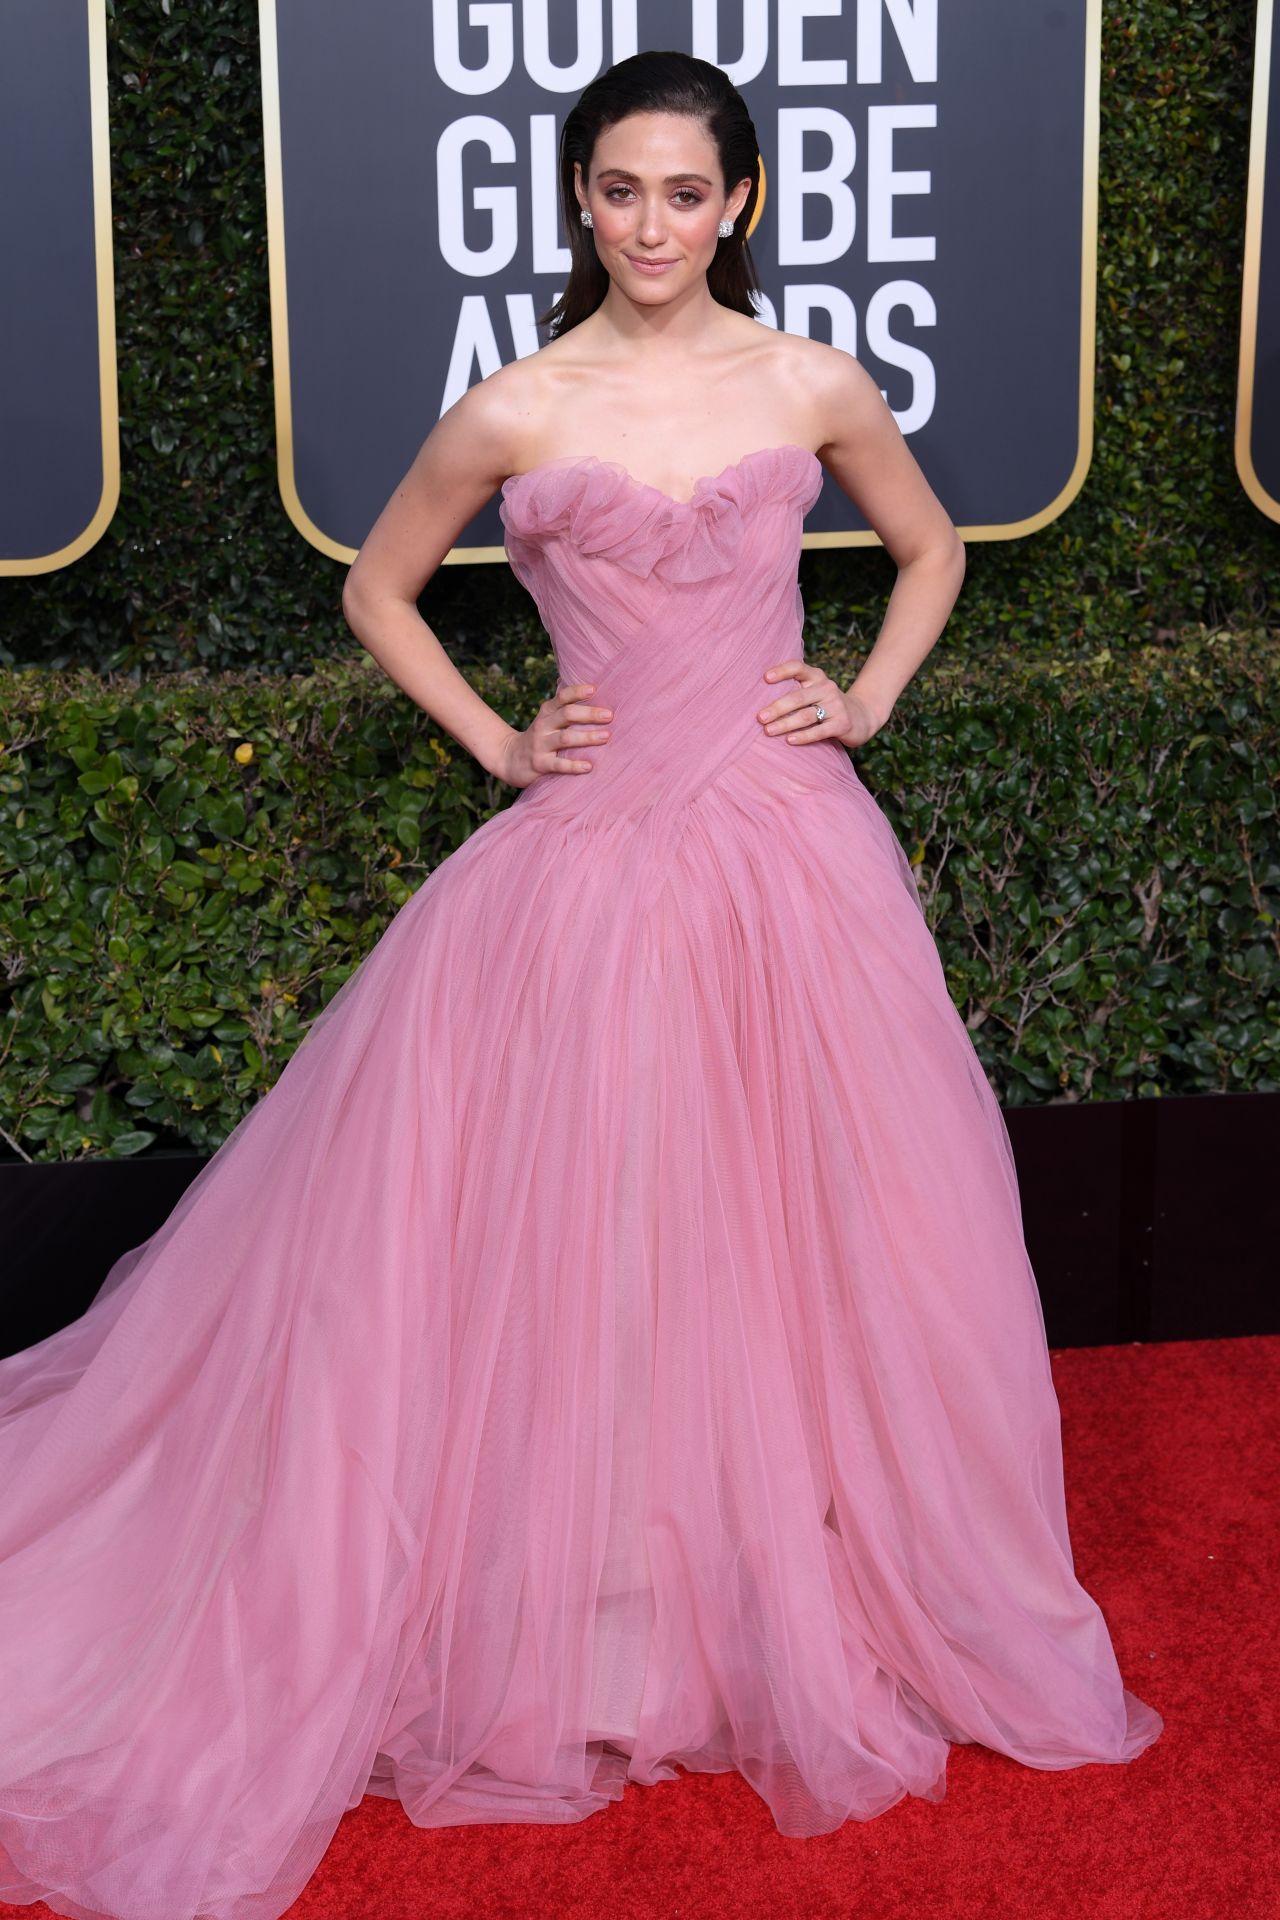 Emmy Rossum 2019 Golden Globe Awards Red Carpet